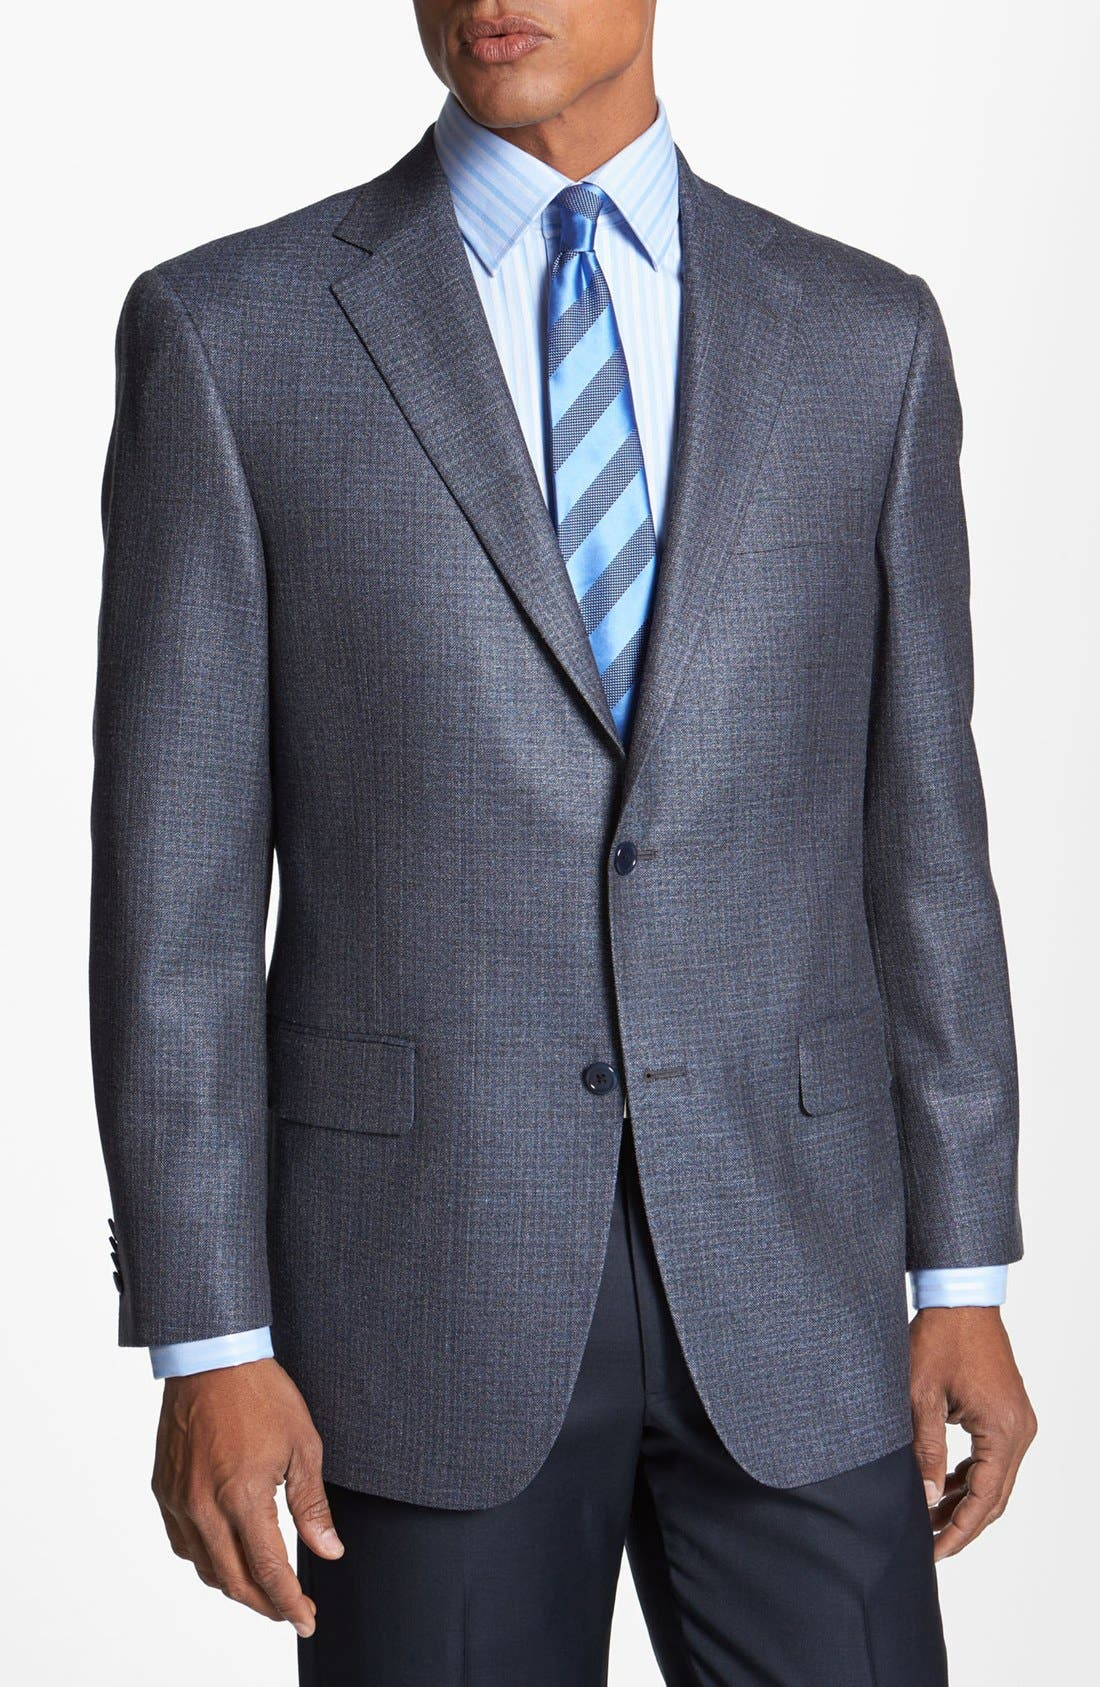 Main Image - Hart Schaffner Marx Silk Blend Sportcoat